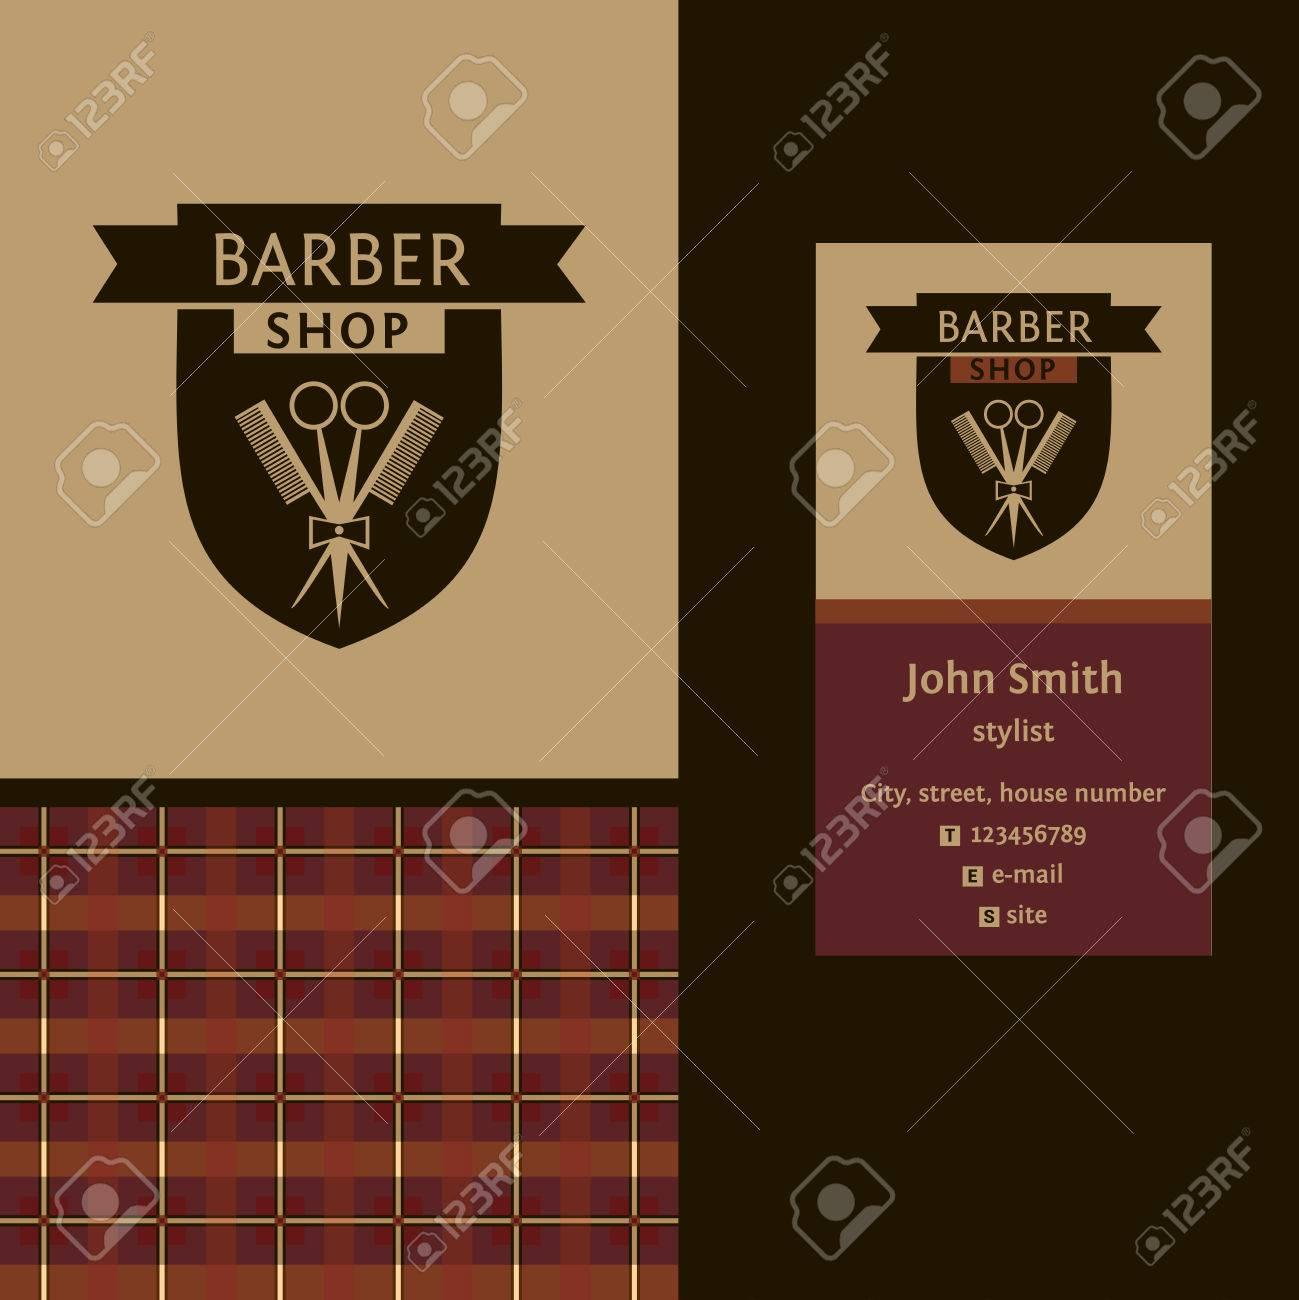 Free Barbershop Business Plan Template Romanticlibraryml - Free barbershop business plan template